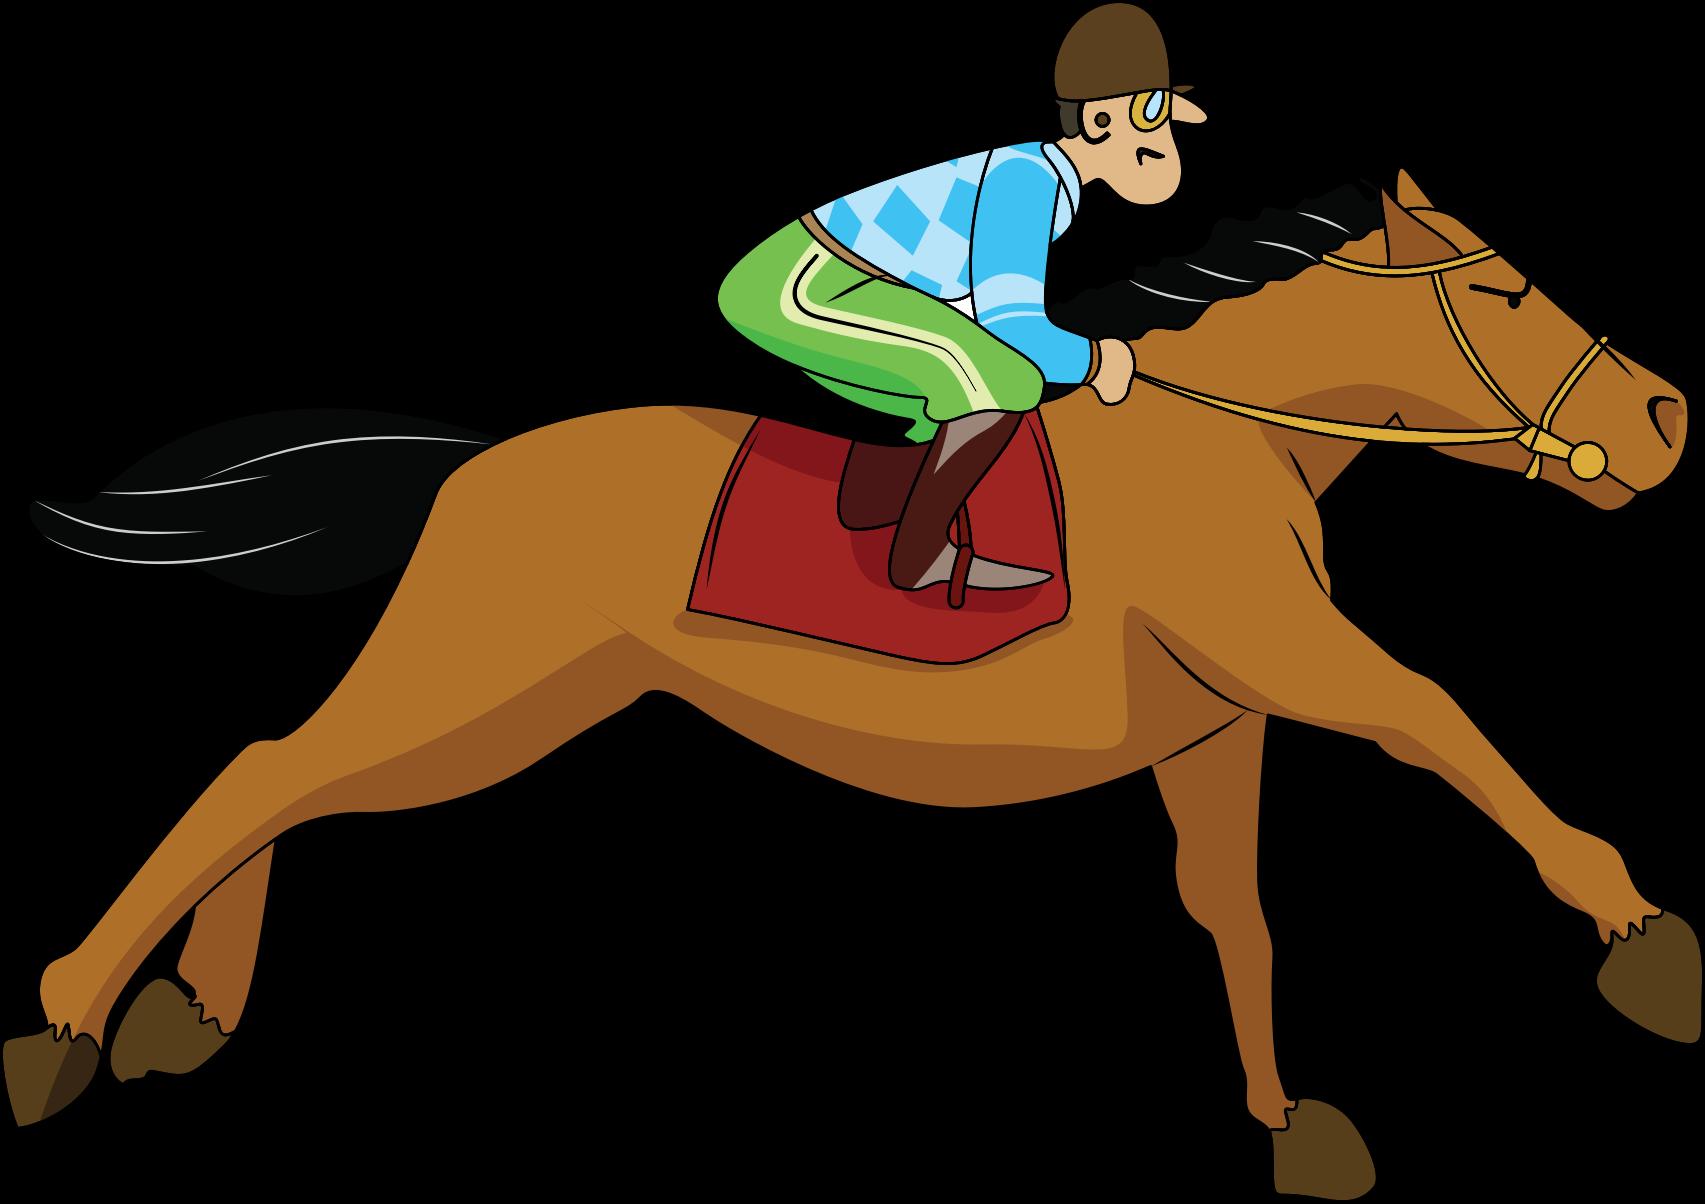 Horse racing track clip art - photo#20